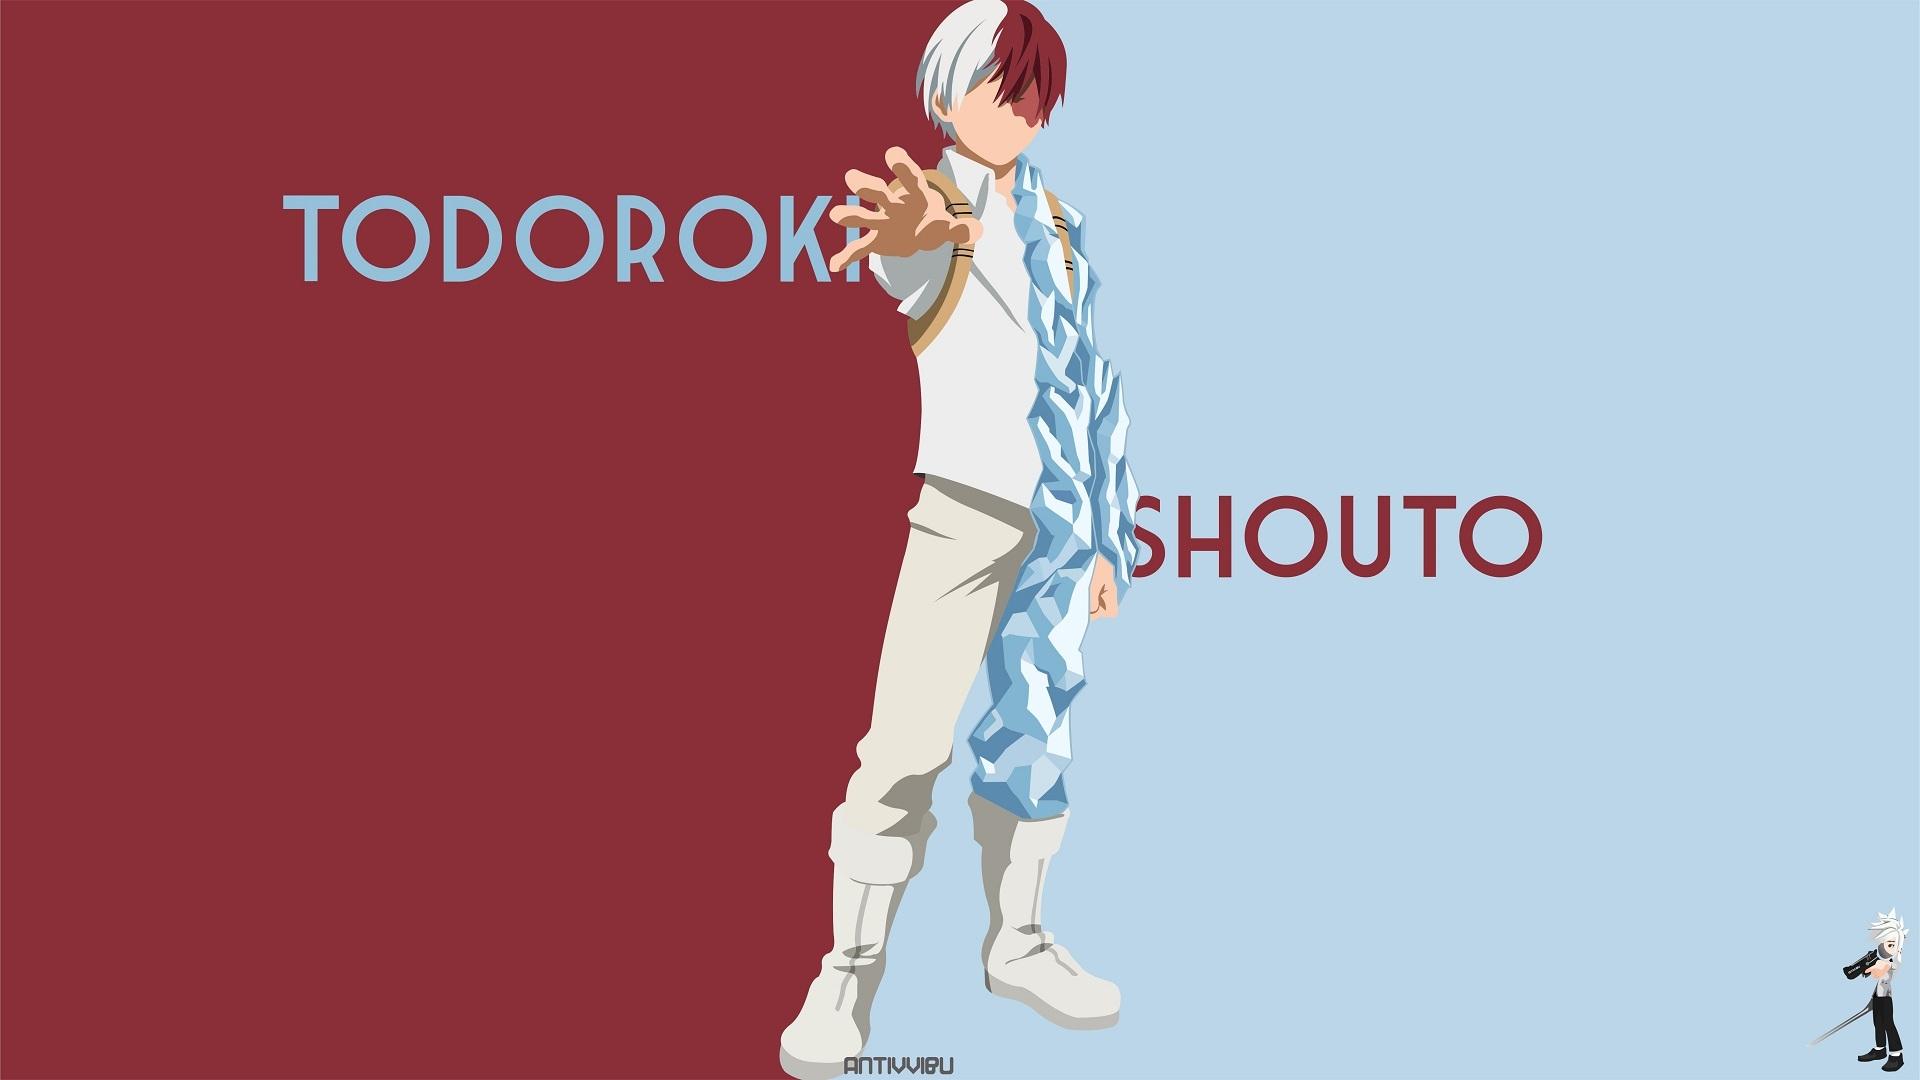 Shoto Todoroki Wallpaper, HD Anime 4K Wallpapers, Images ...